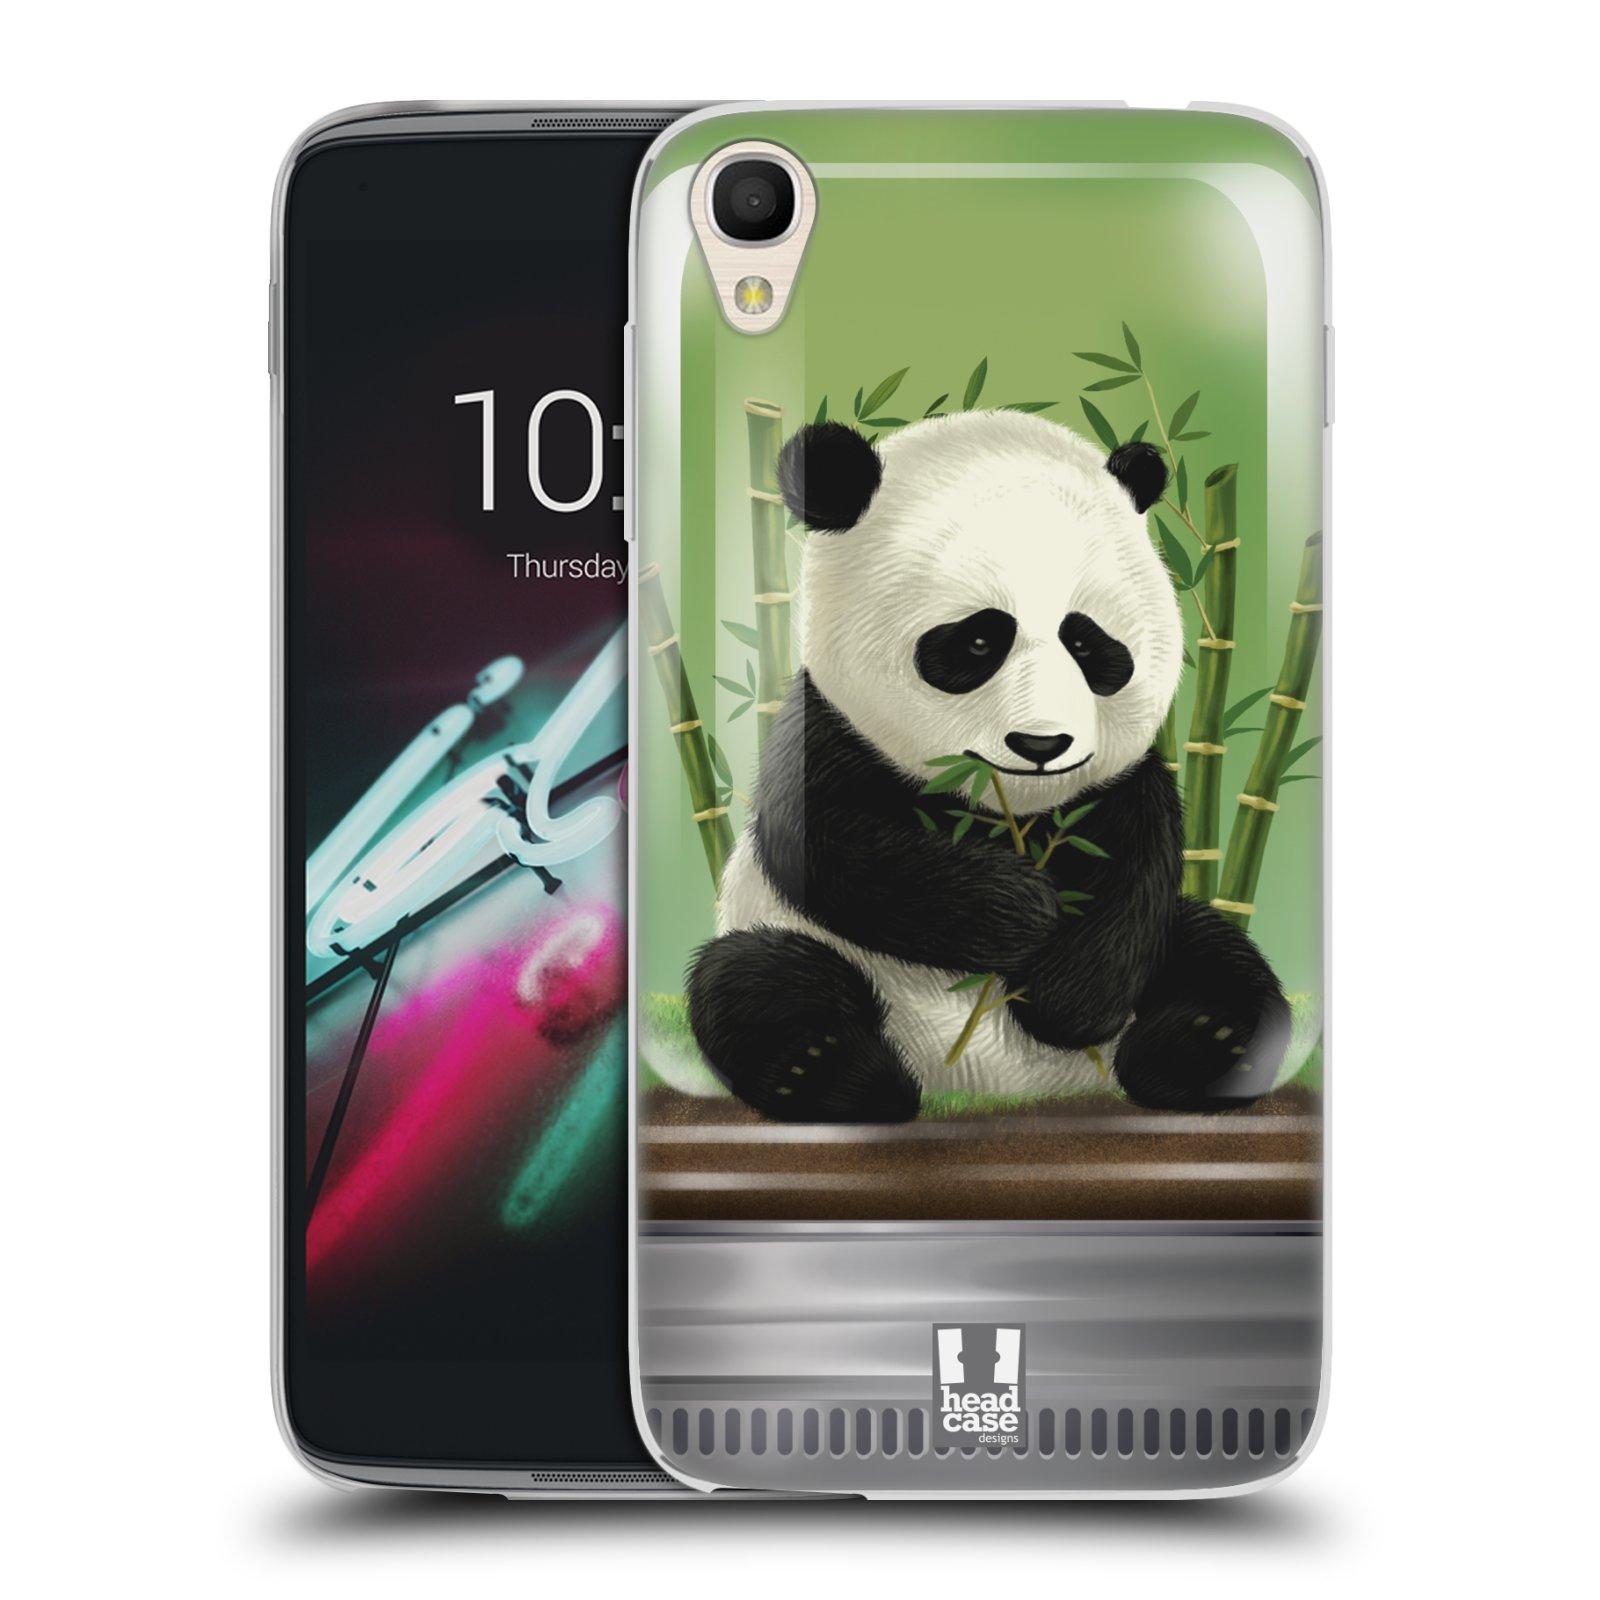 HEAD CASE silikonový obal na mobil Alcatel Idol 3 OT-6039Y (4.7) vzor Zvířátka v těžítku panda